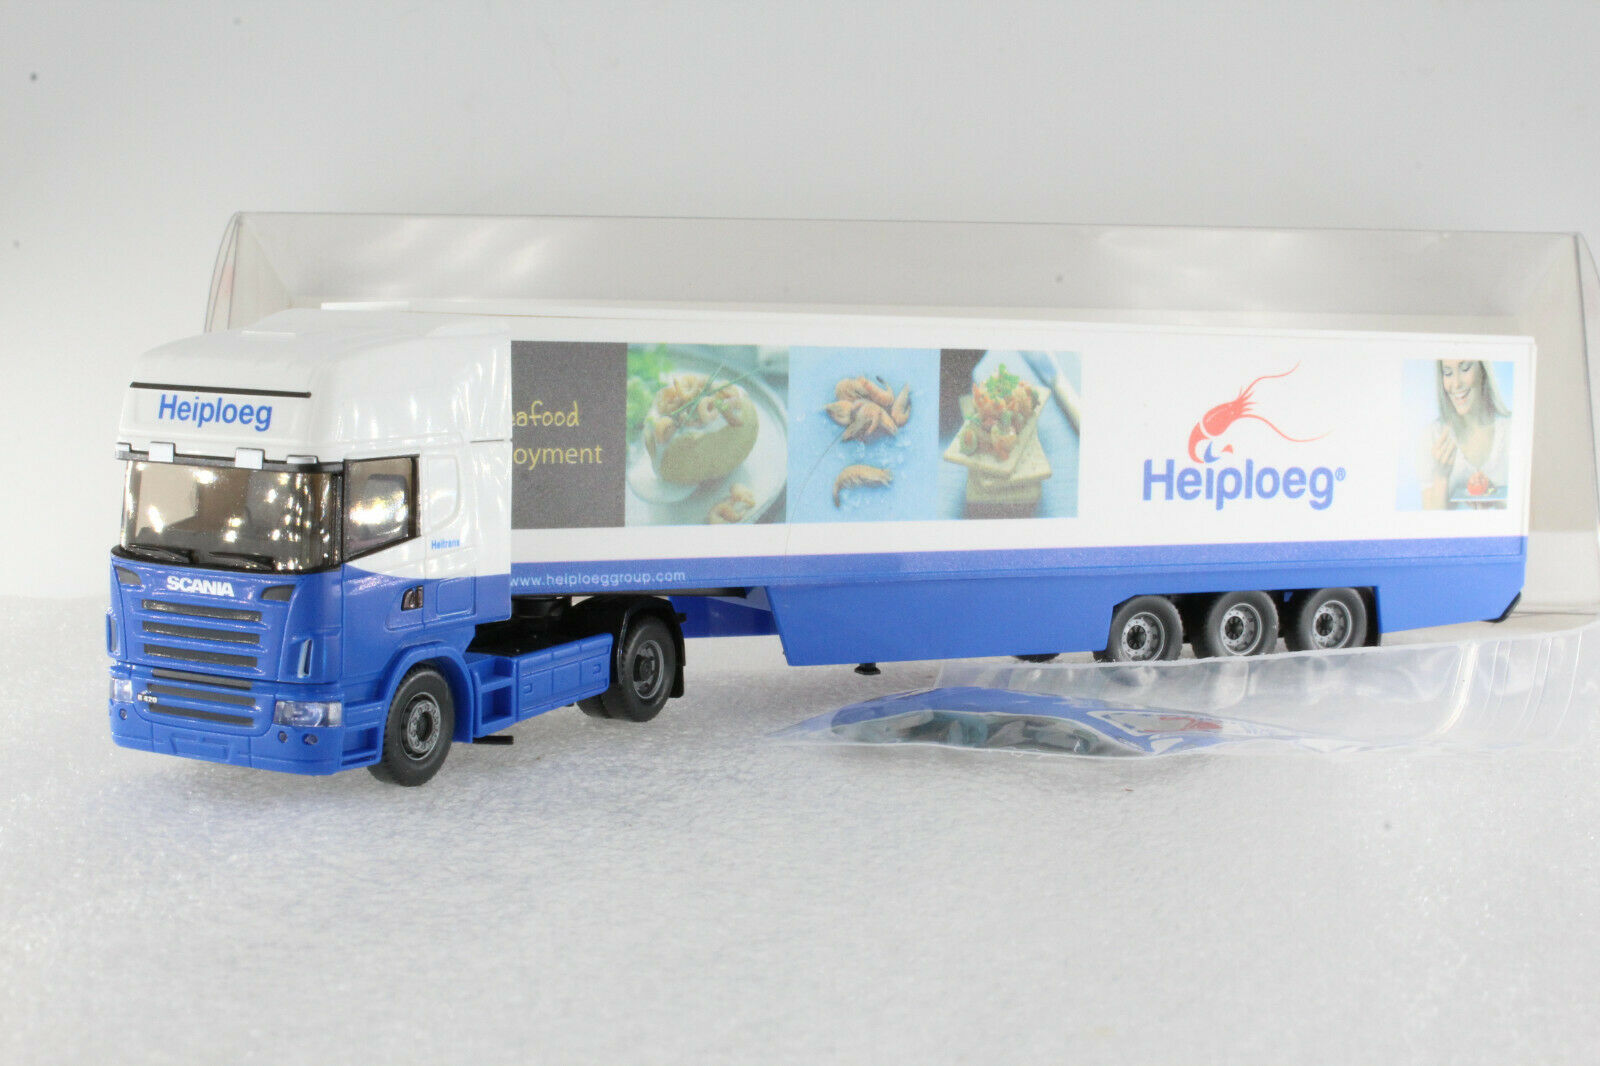 1:87 Wiking 052805 Kühlkoffersattelzug Scania R420 Topline Blitzversand per DHL